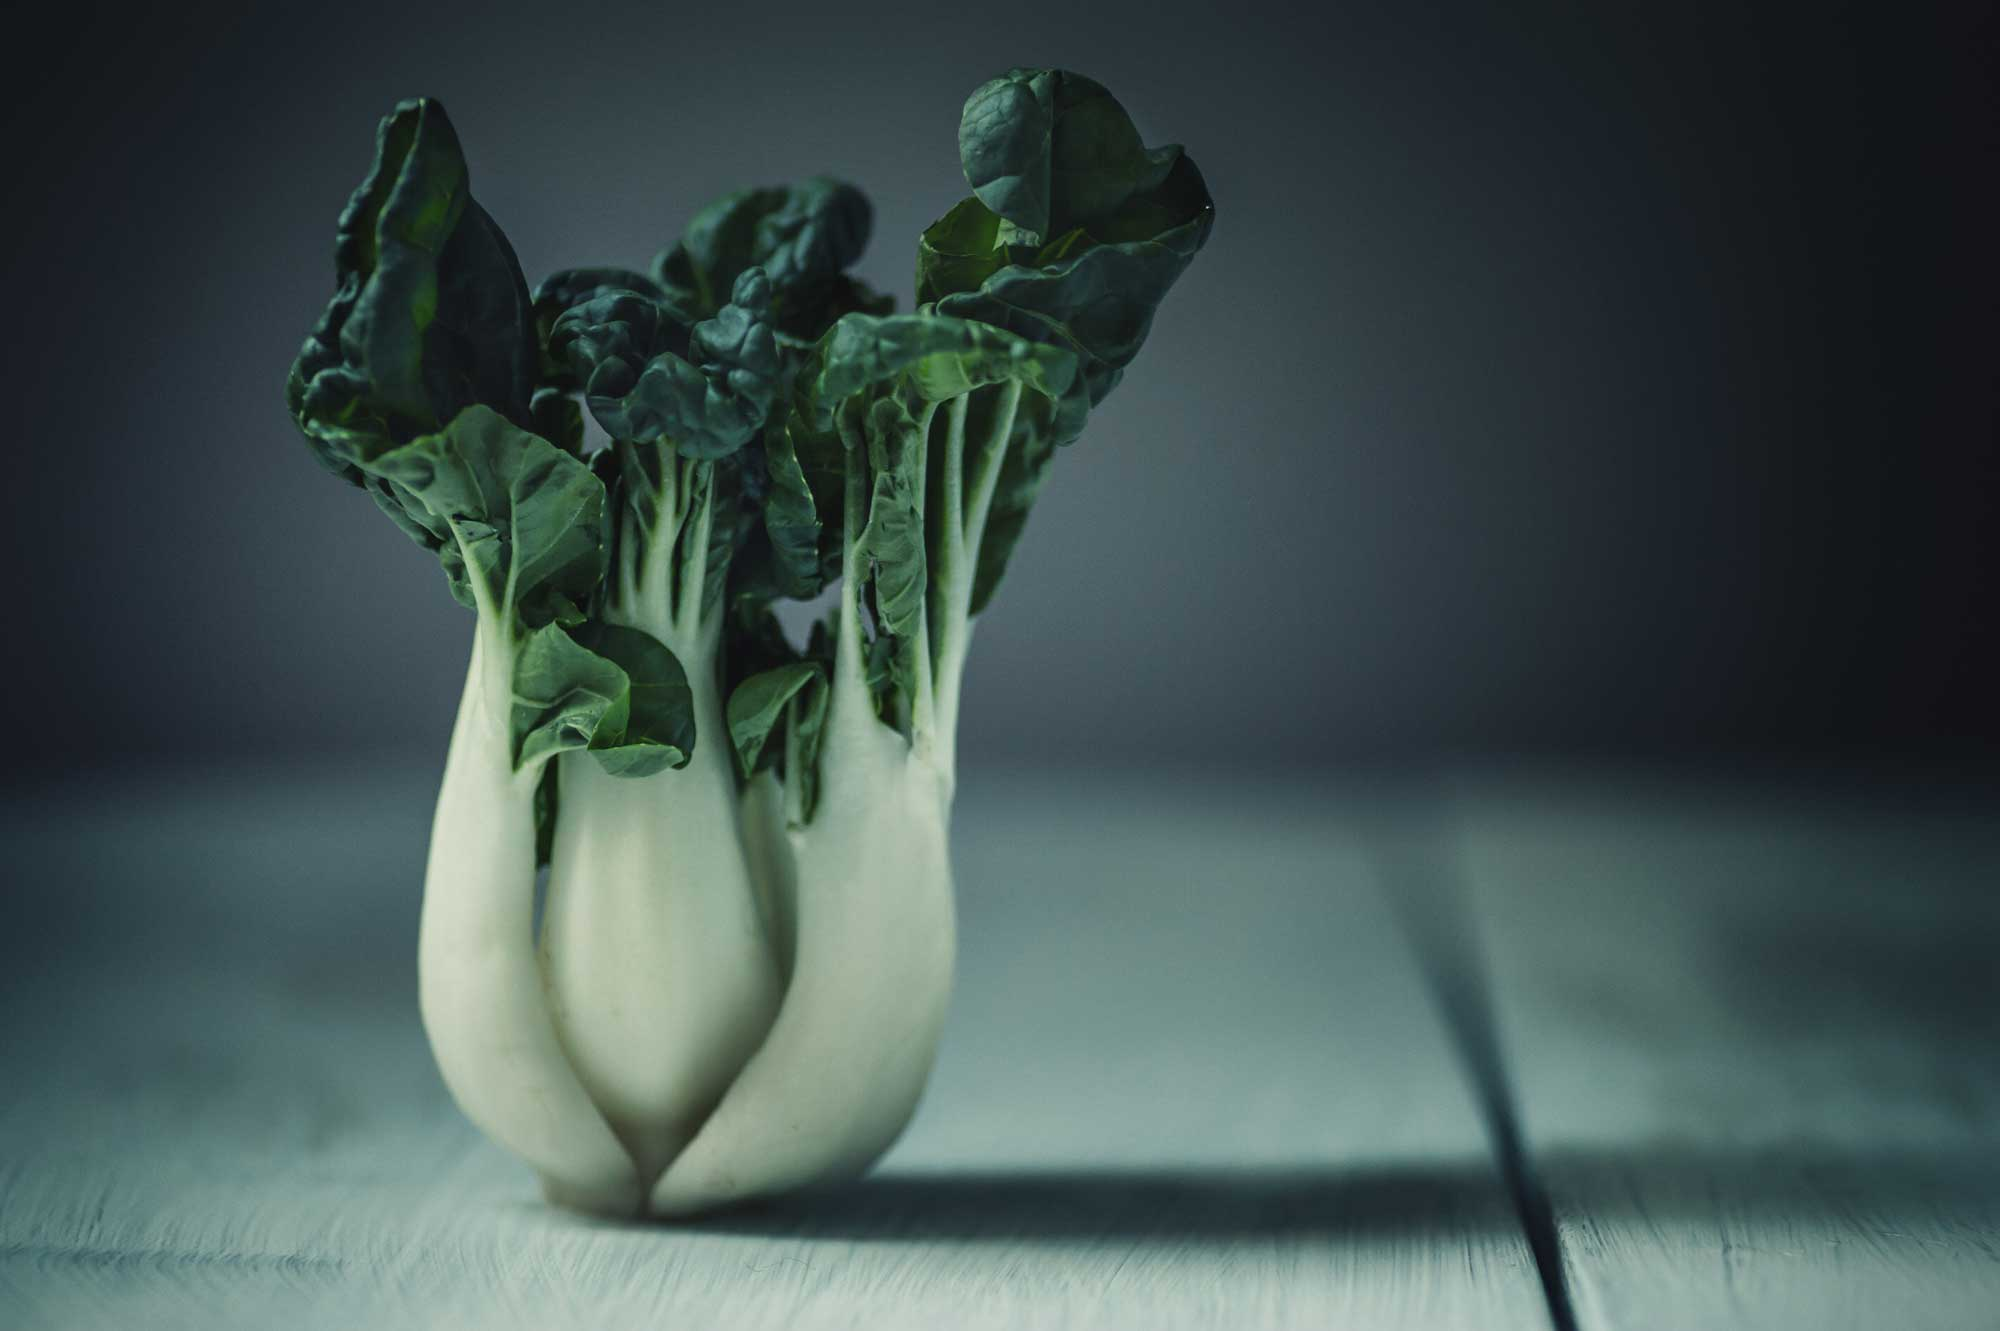 5 Ways to Cook Bok Choy